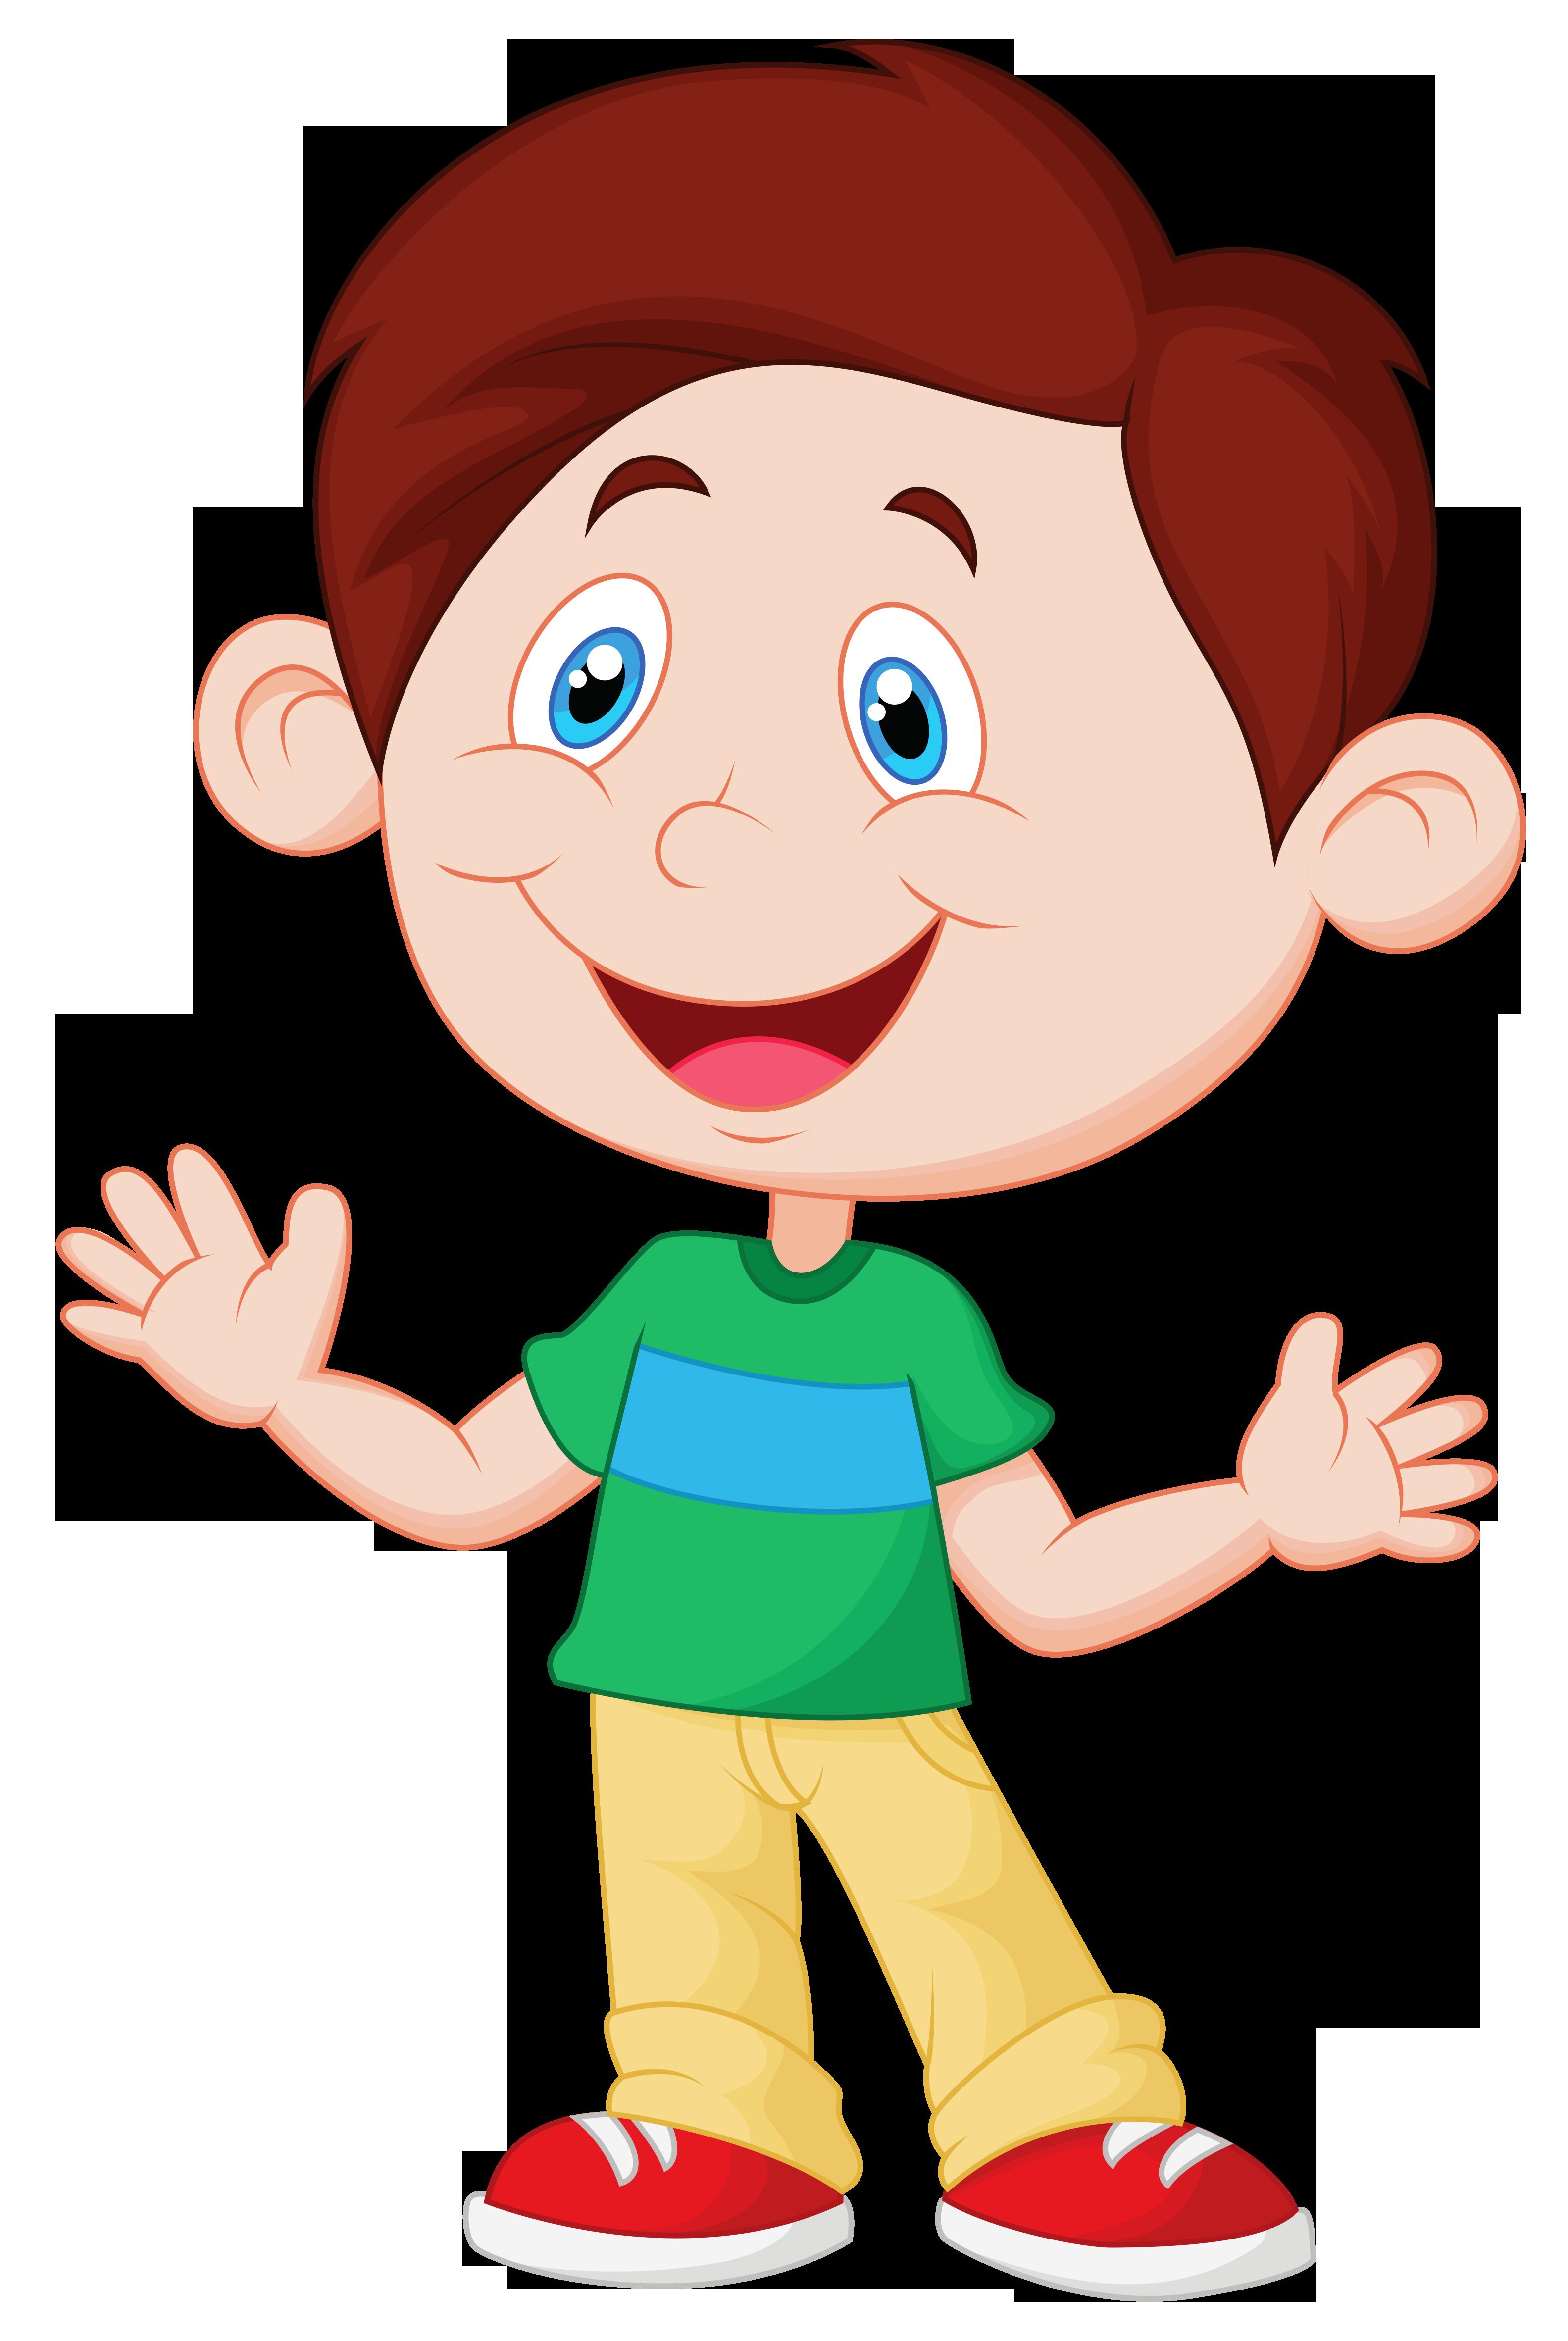 Emotions clipart emotional person. Cartoon child clip art